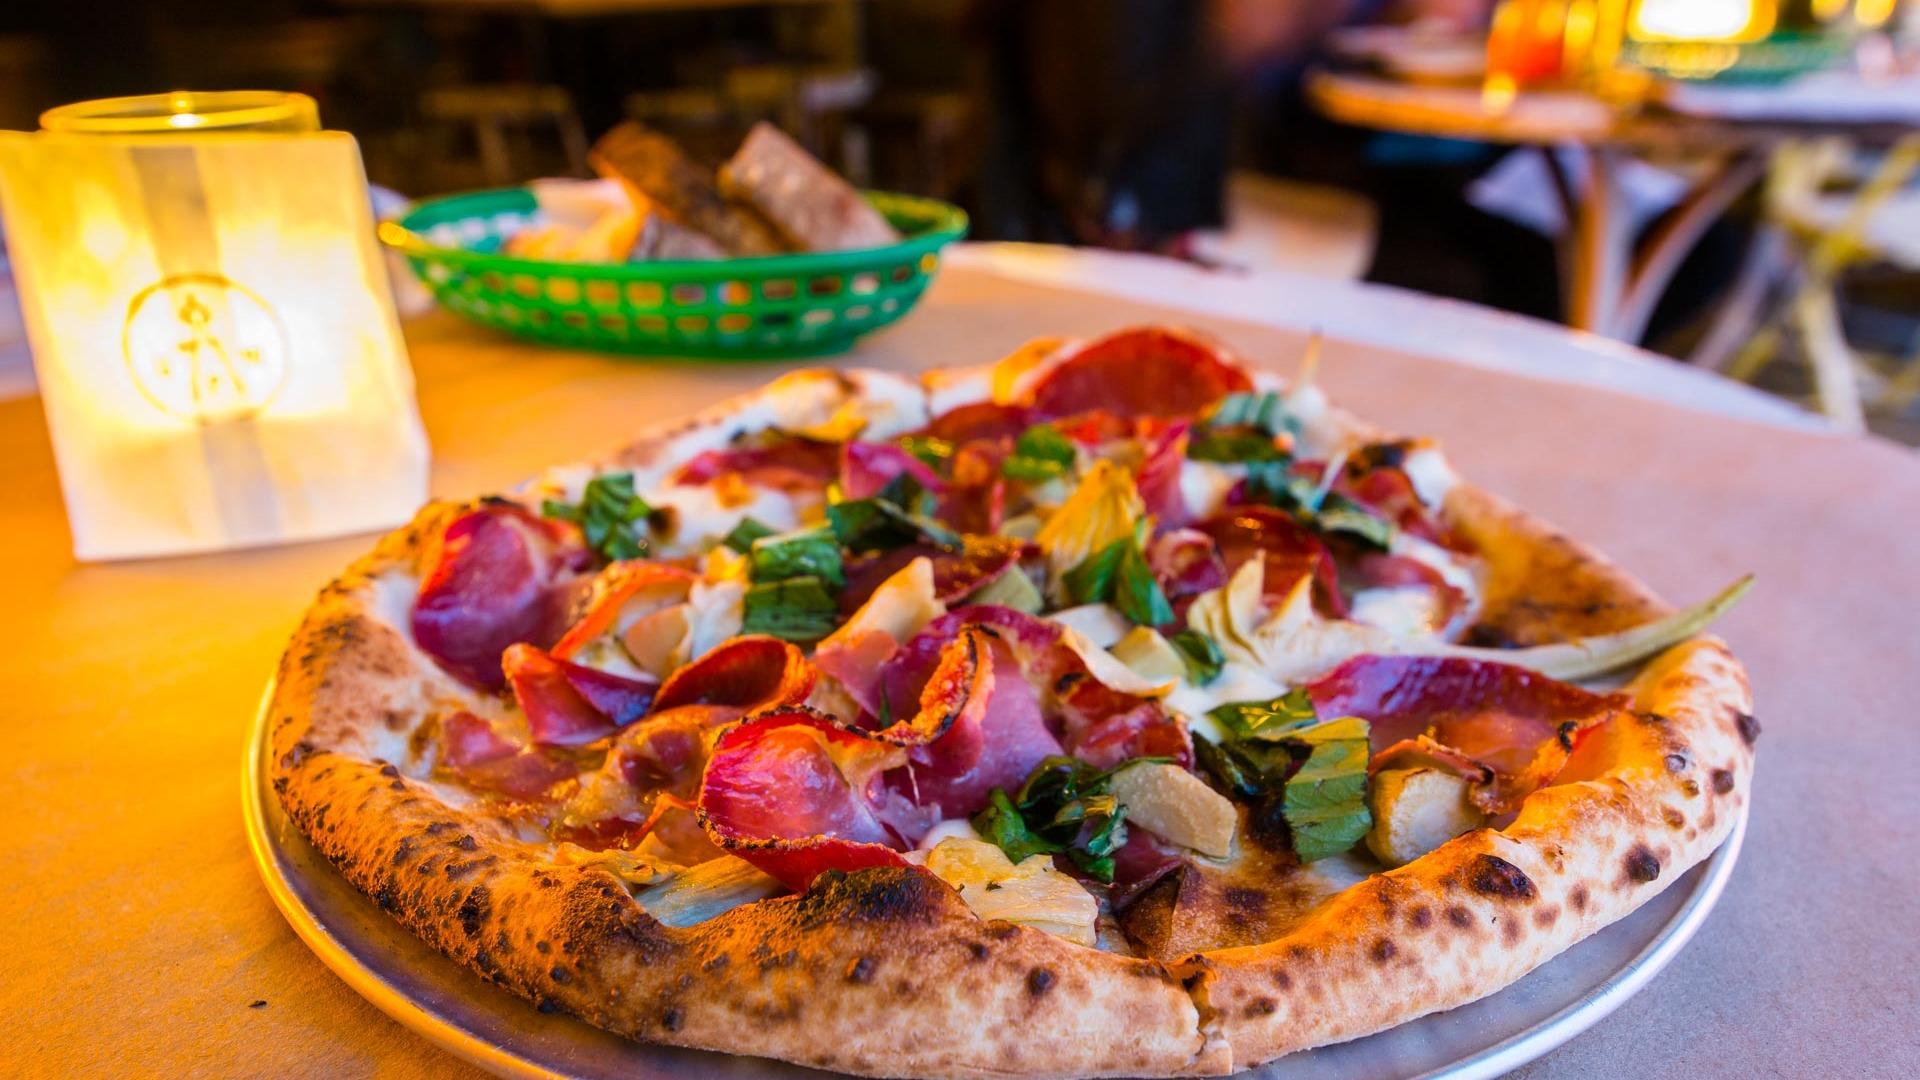 Union pizza works 11